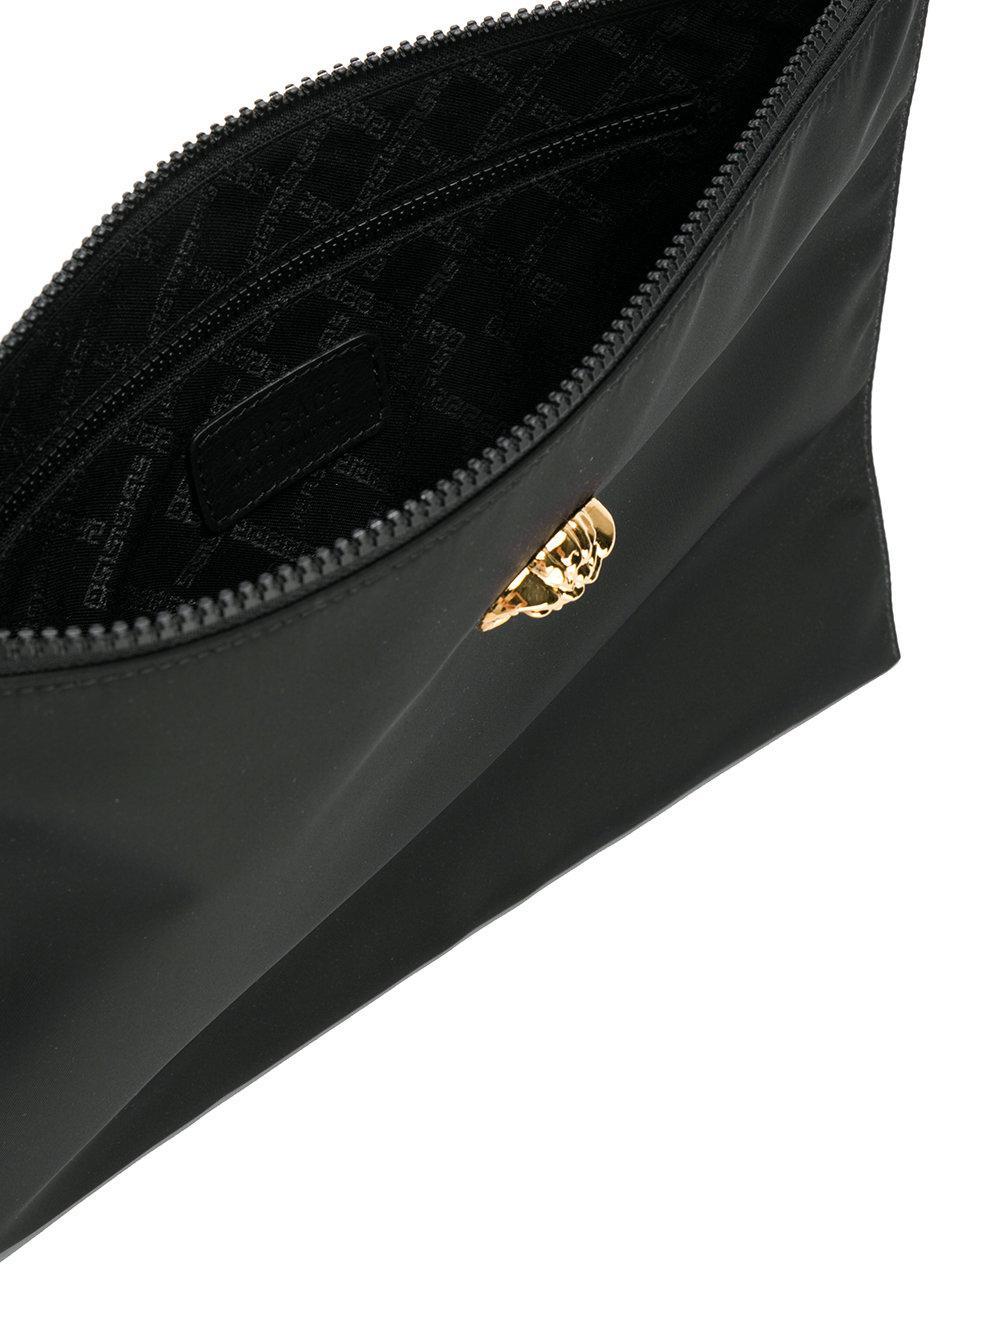 Versace Medusa Head Clutch Bag in Black for Men - Lyst 13bdfff48e